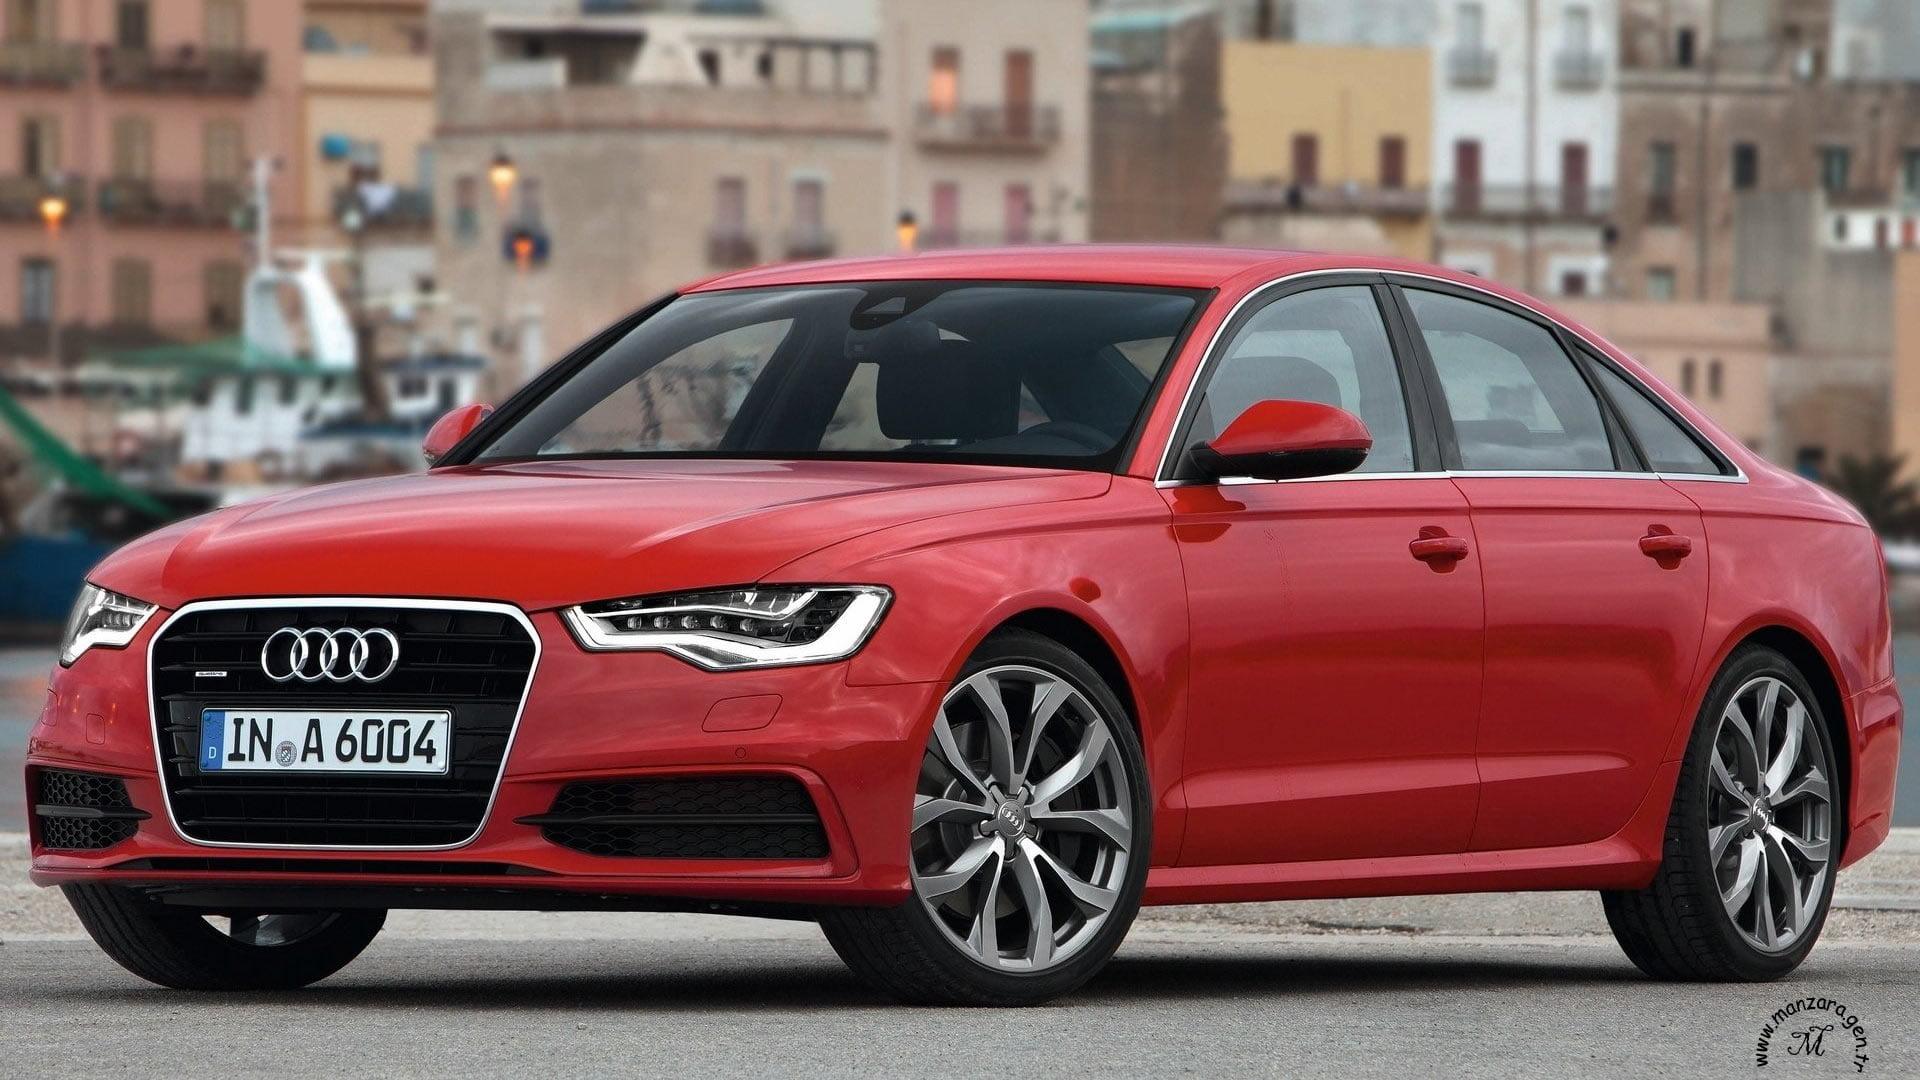 Audi A6 – 2012